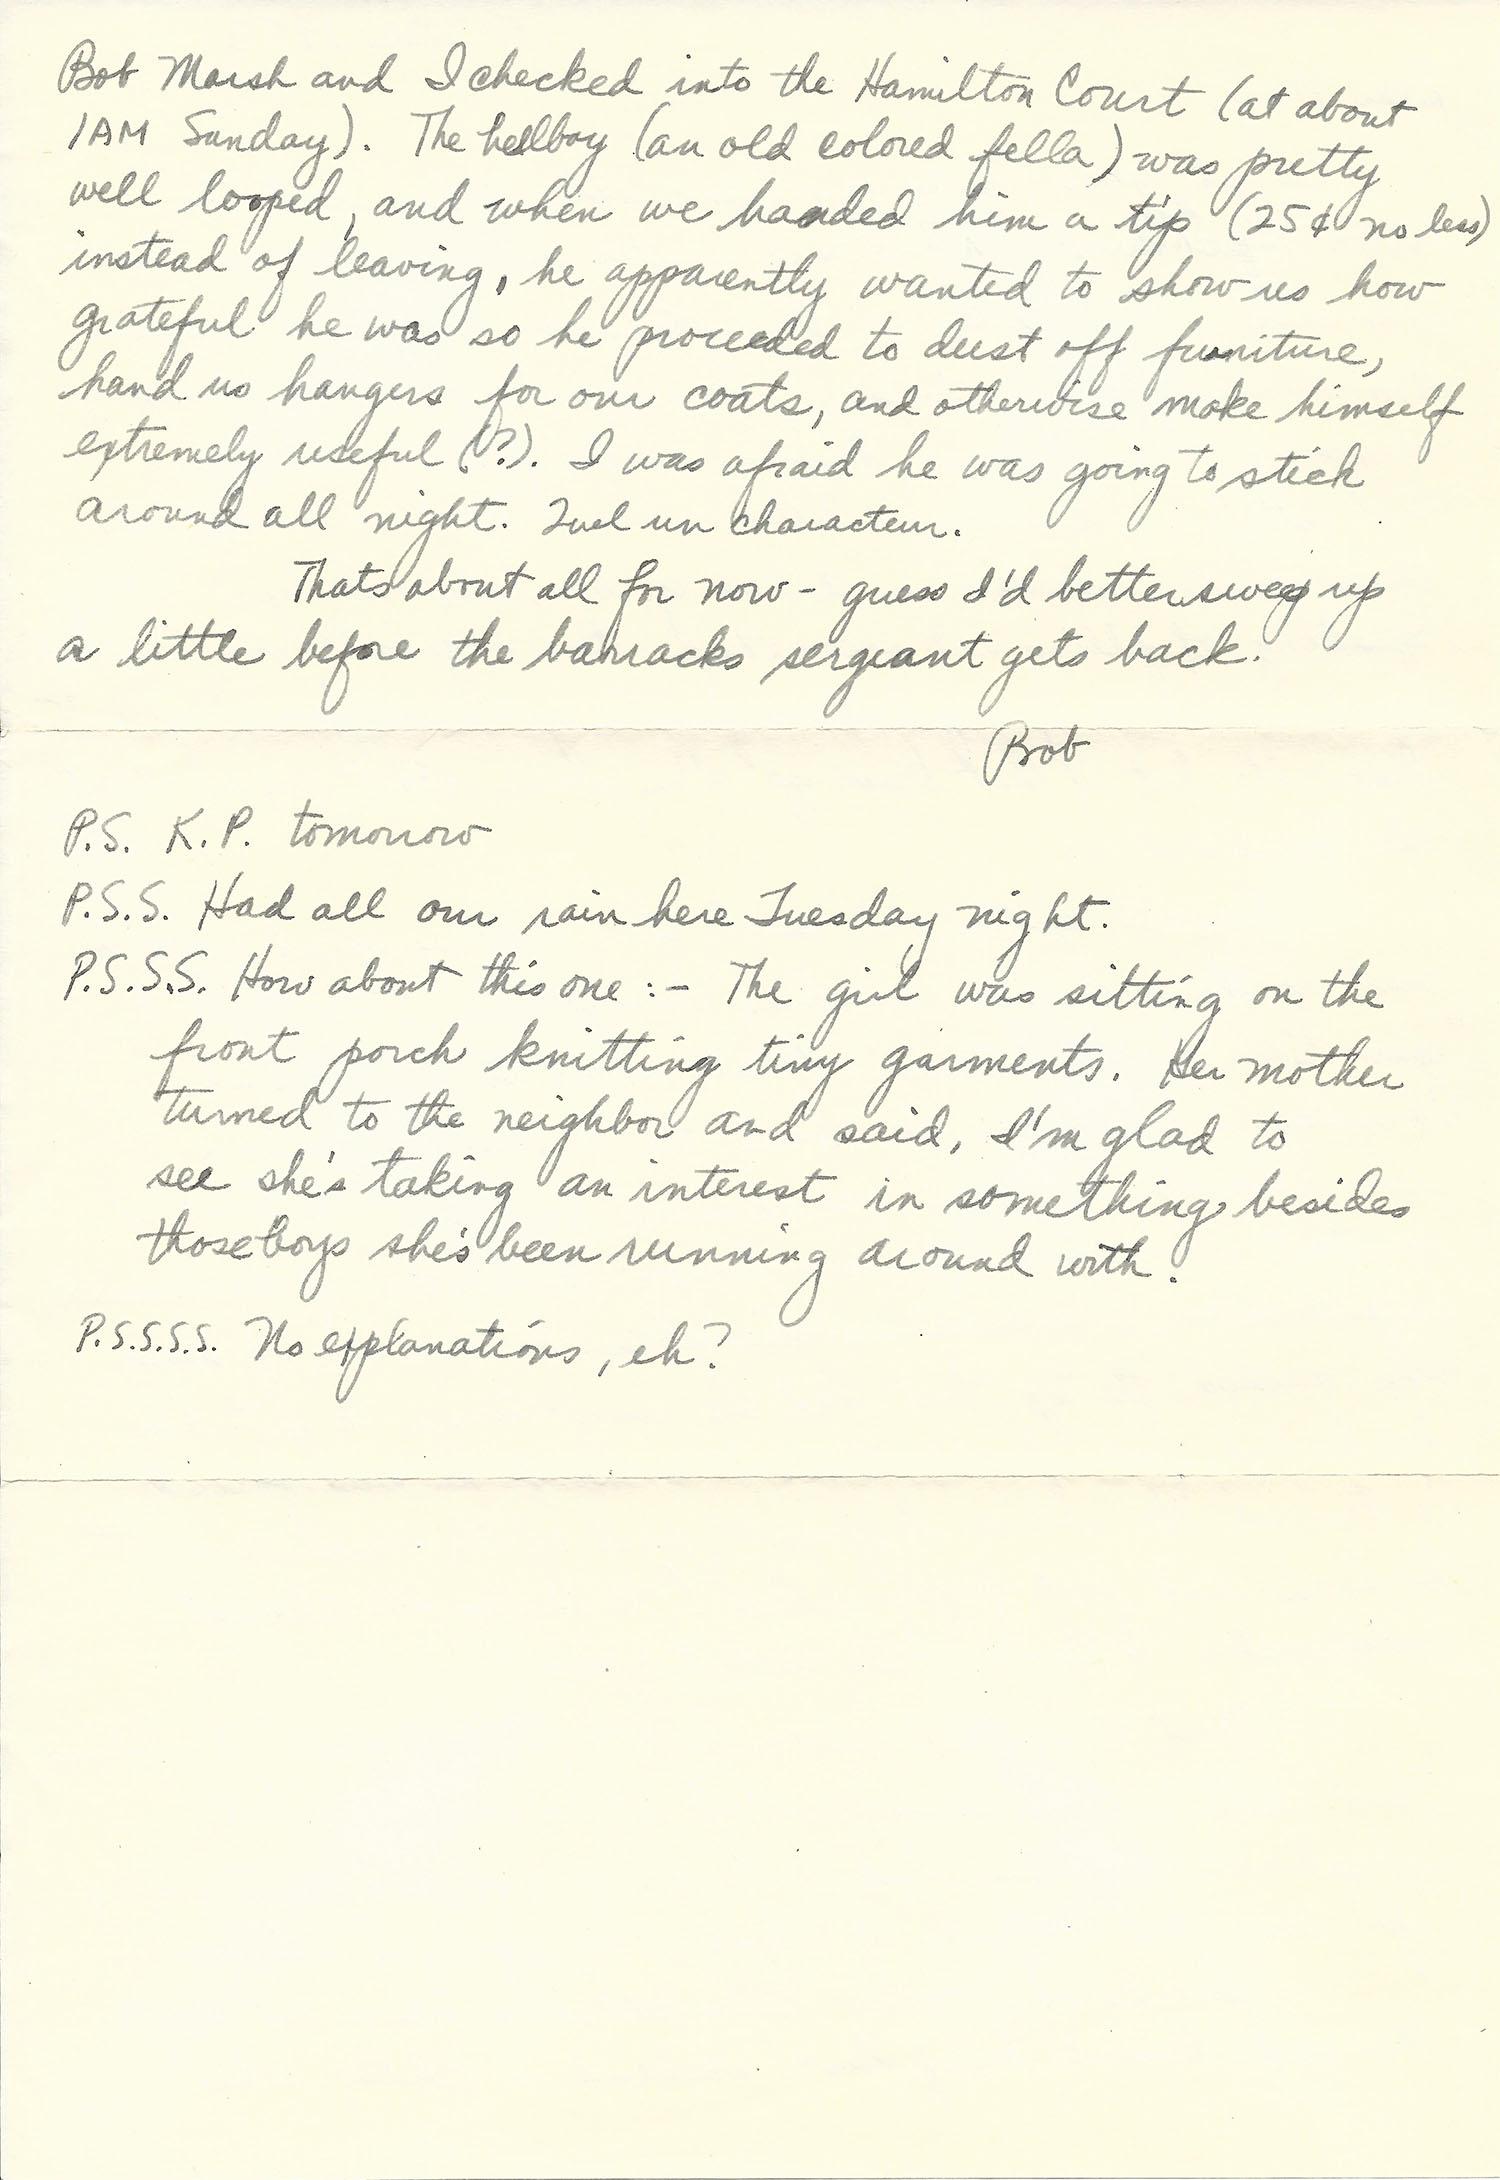 Mar. 5, 1953 (Bob) Page 2